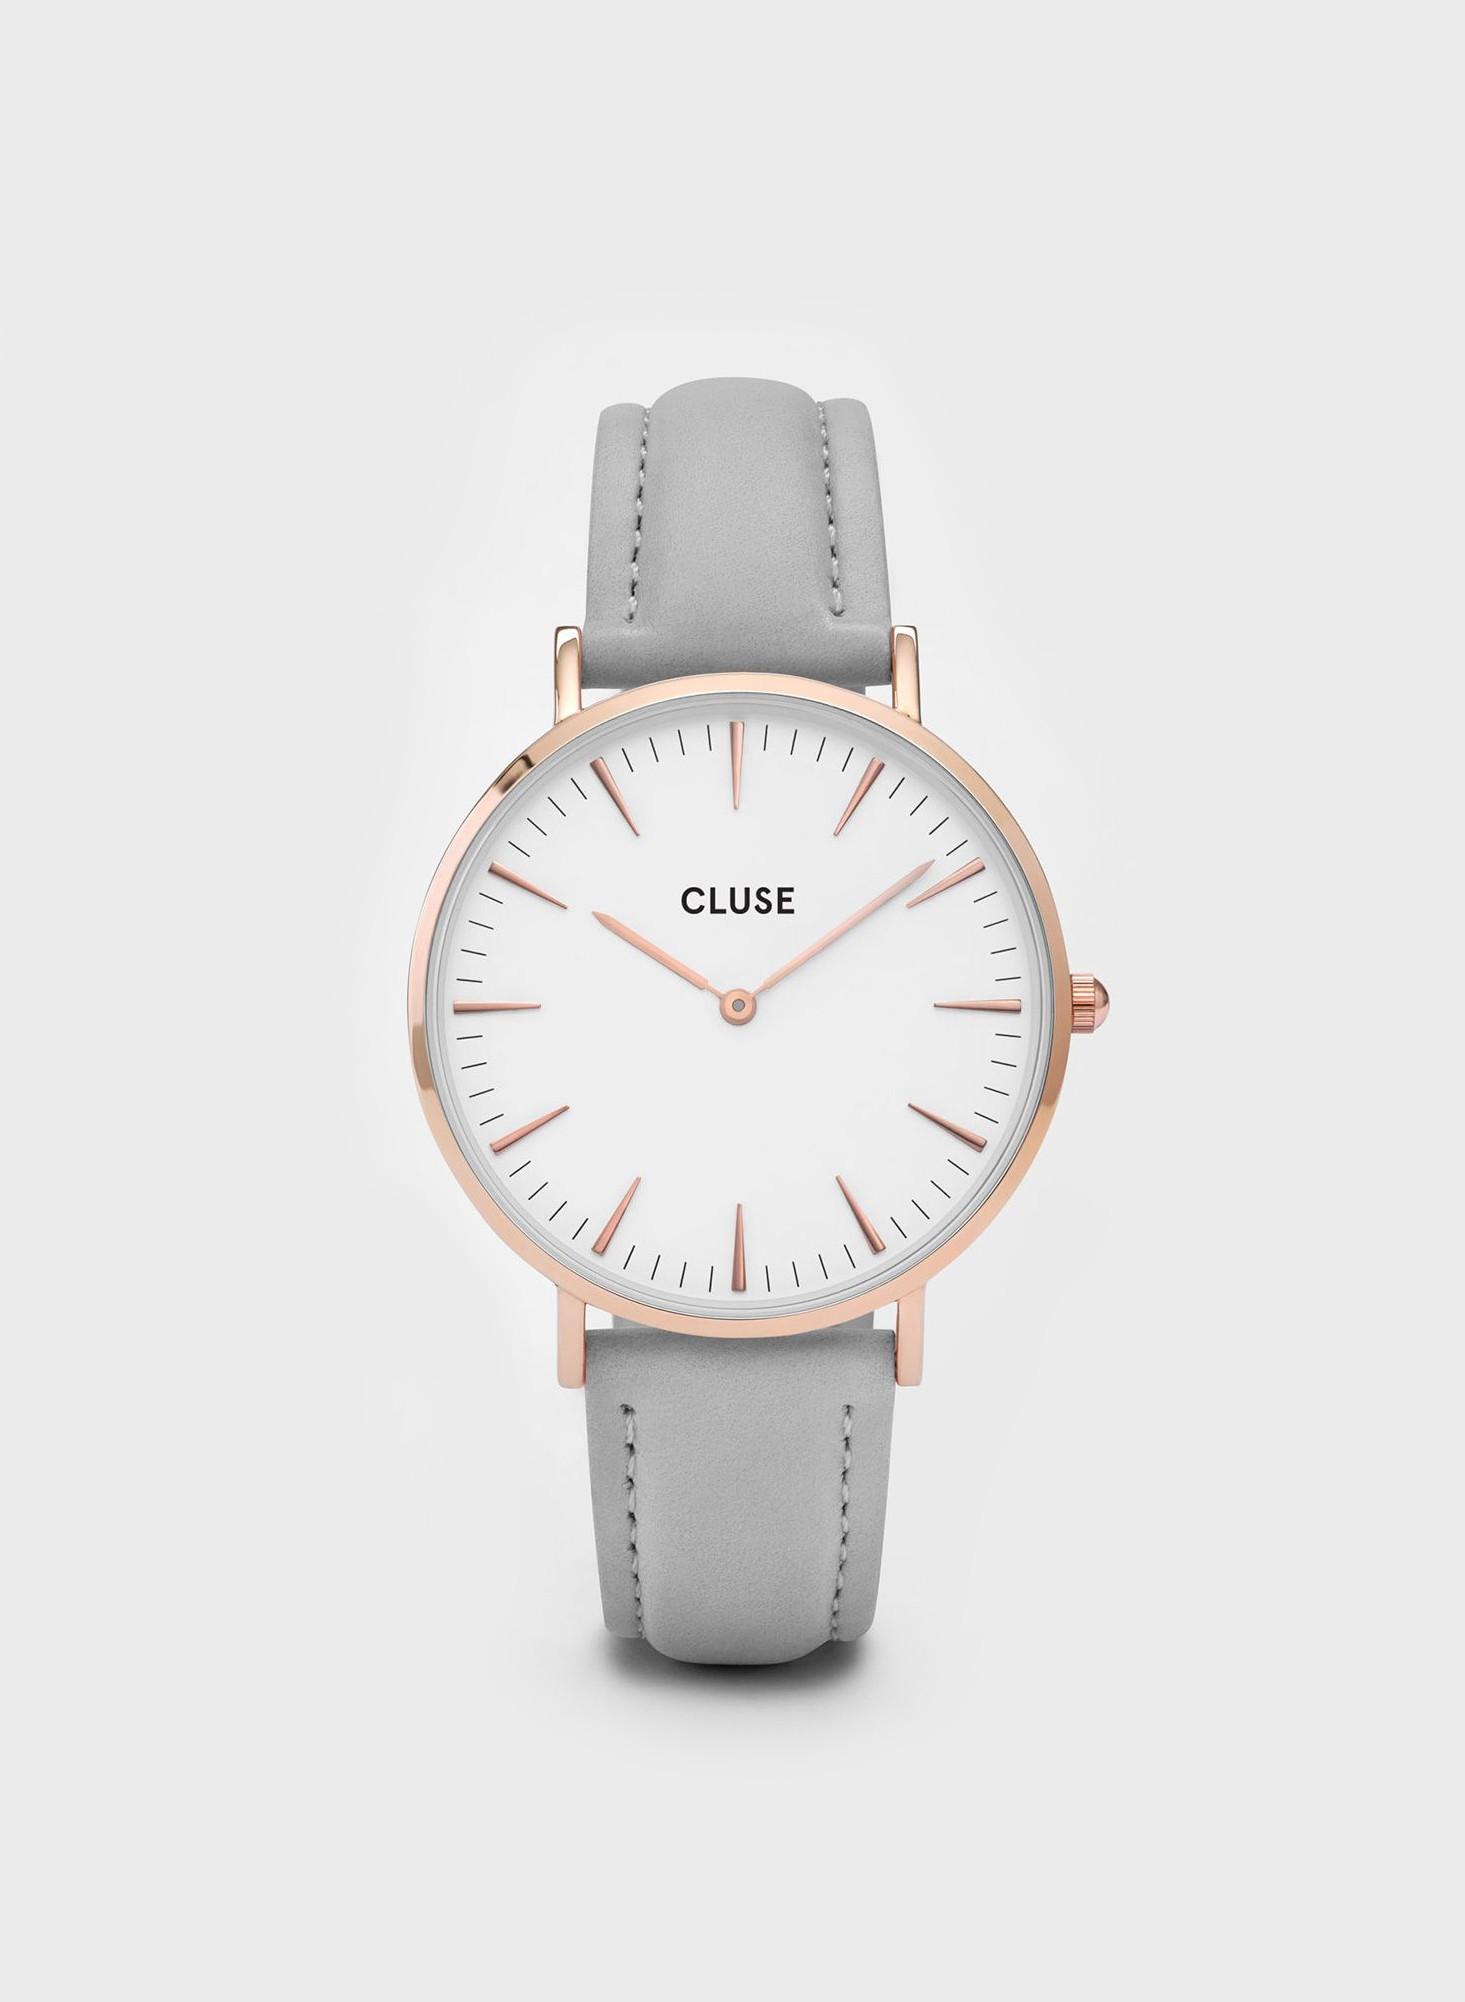 cluse la boheme rose gold watch grey from vuela boutique. Black Bedroom Furniture Sets. Home Design Ideas